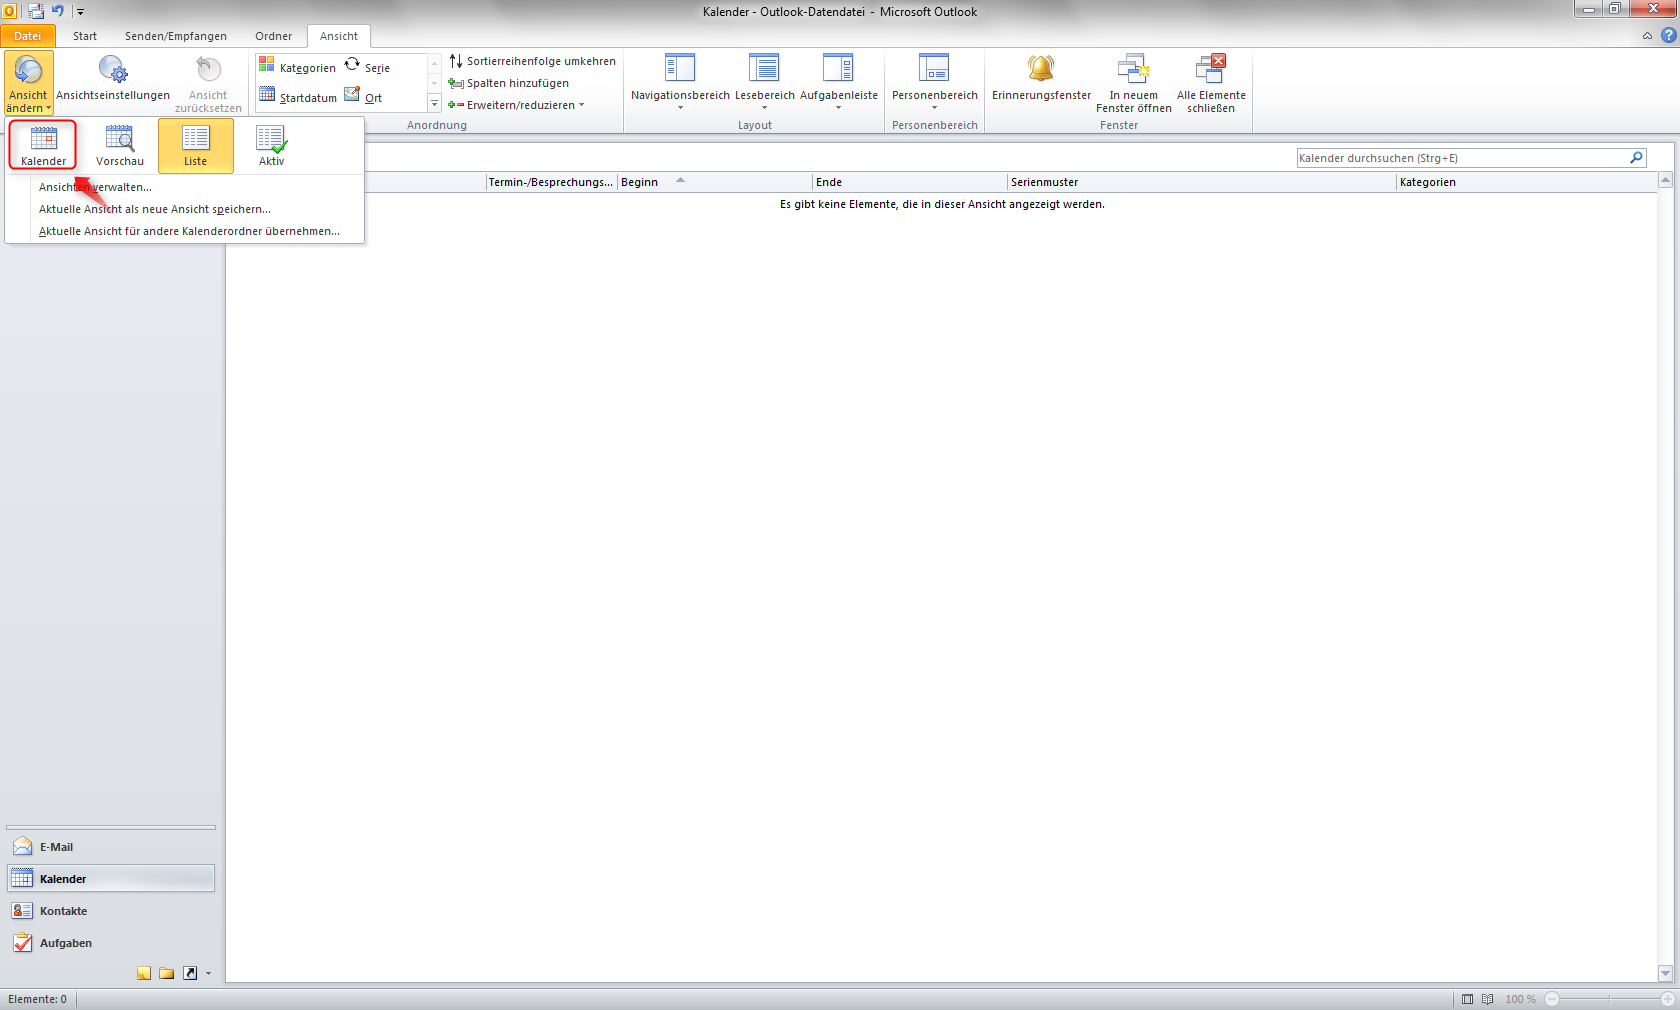 08-Outlook-2010-Kalendereintraege-entfernen-Ansicht-aendern-Kalender-470.png?nocache=1312379611987